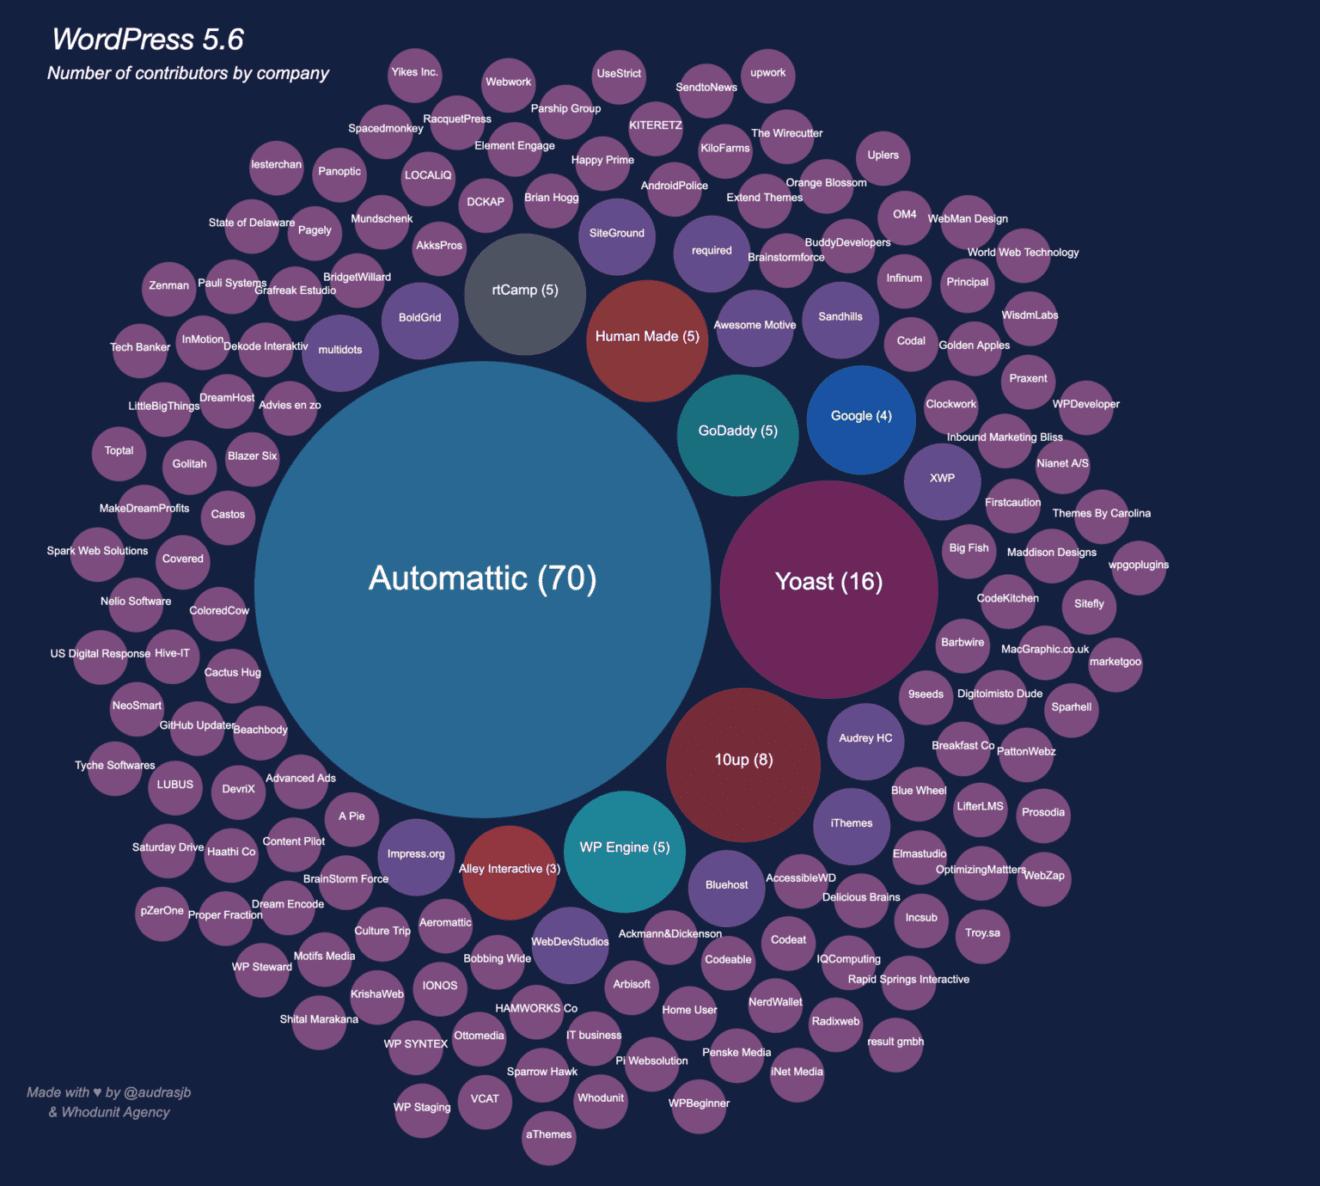 wp-56-company-contributors-1536x1380